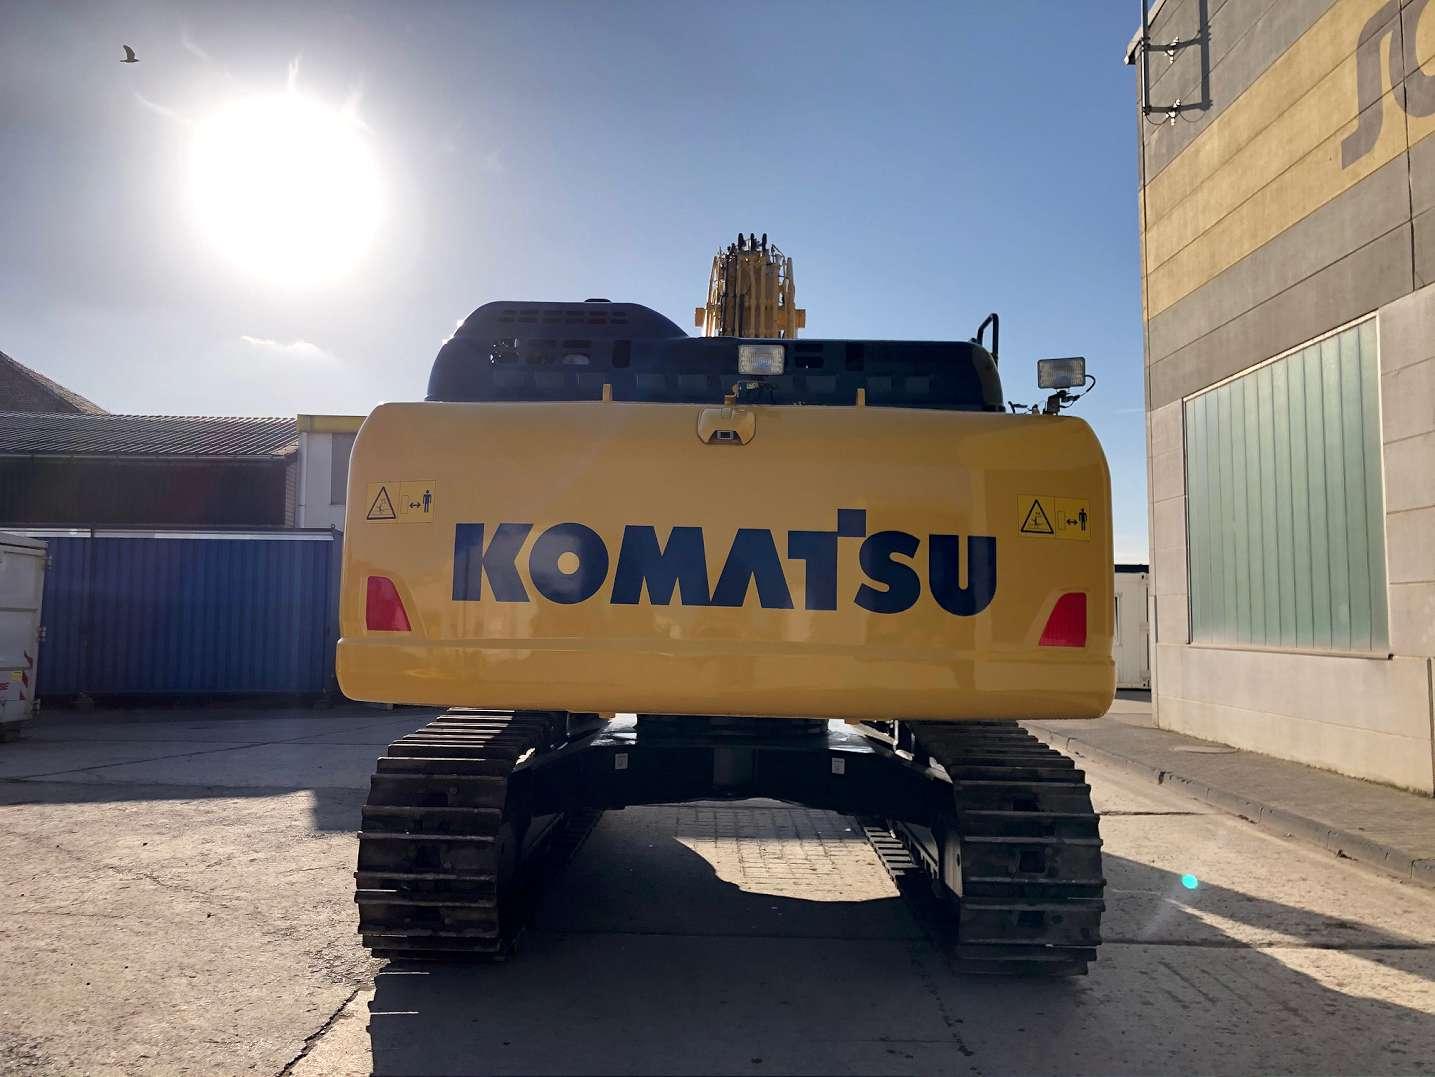 KOMATSU HB 365 LC-3 - 04